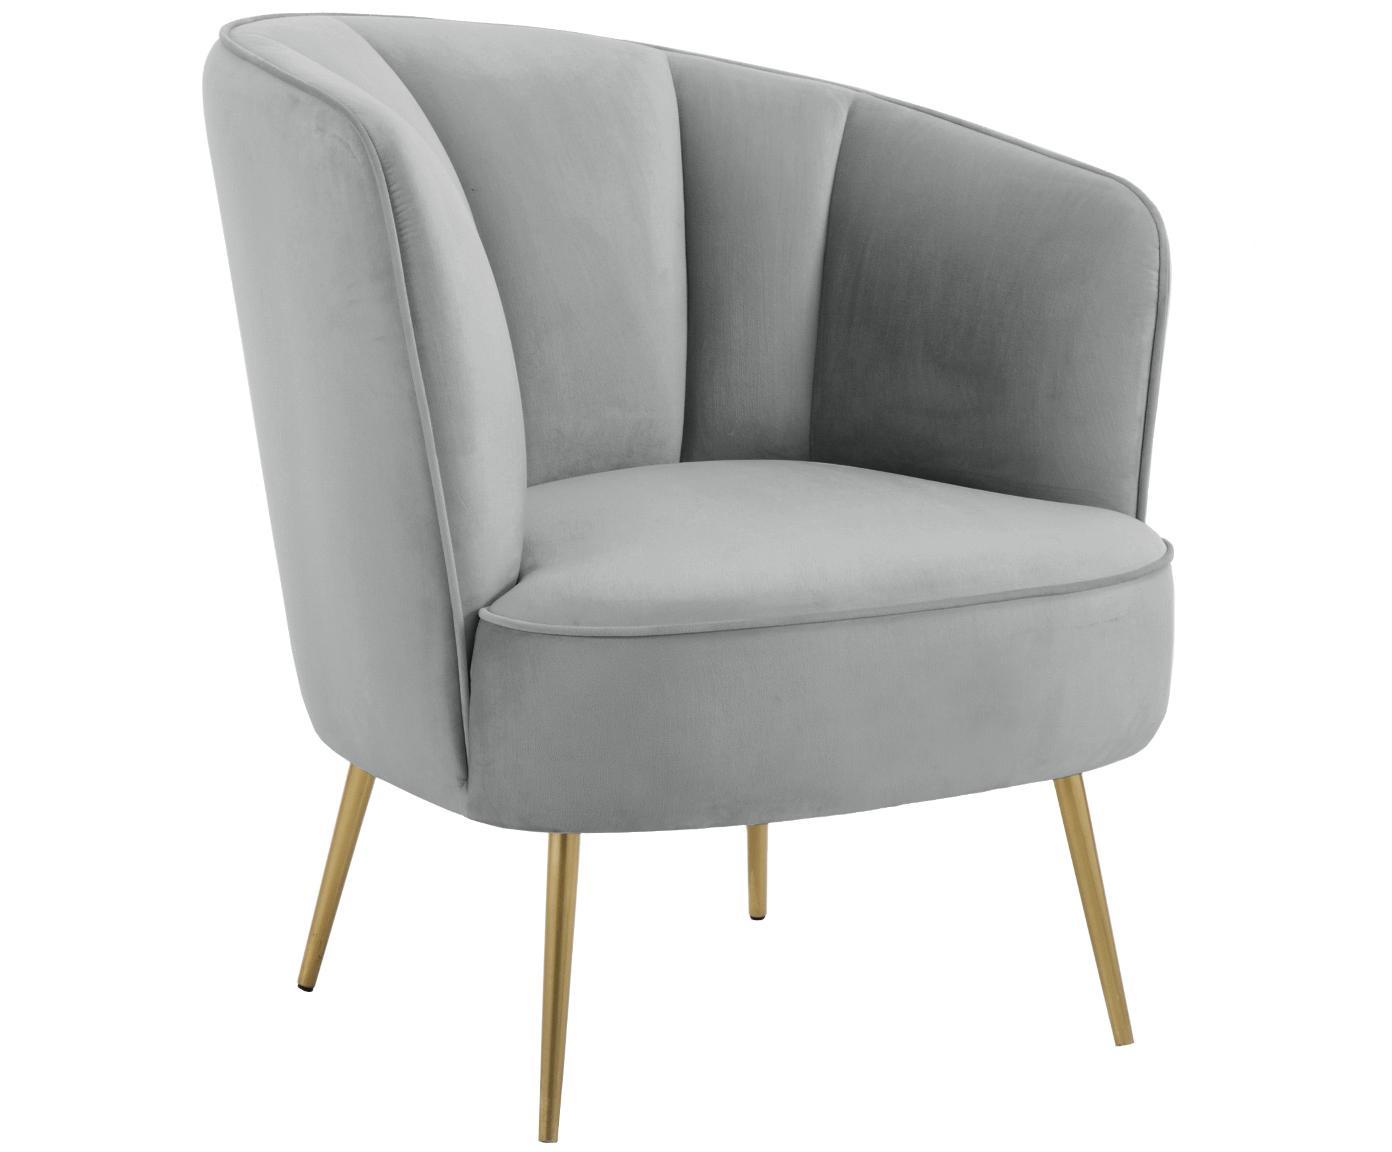 Fluwelen fauteuil Louise, Bekleding: fluweel (polyester), Poten: gecoat metaal, Lichtgrijs, B 76 x D 74 cm